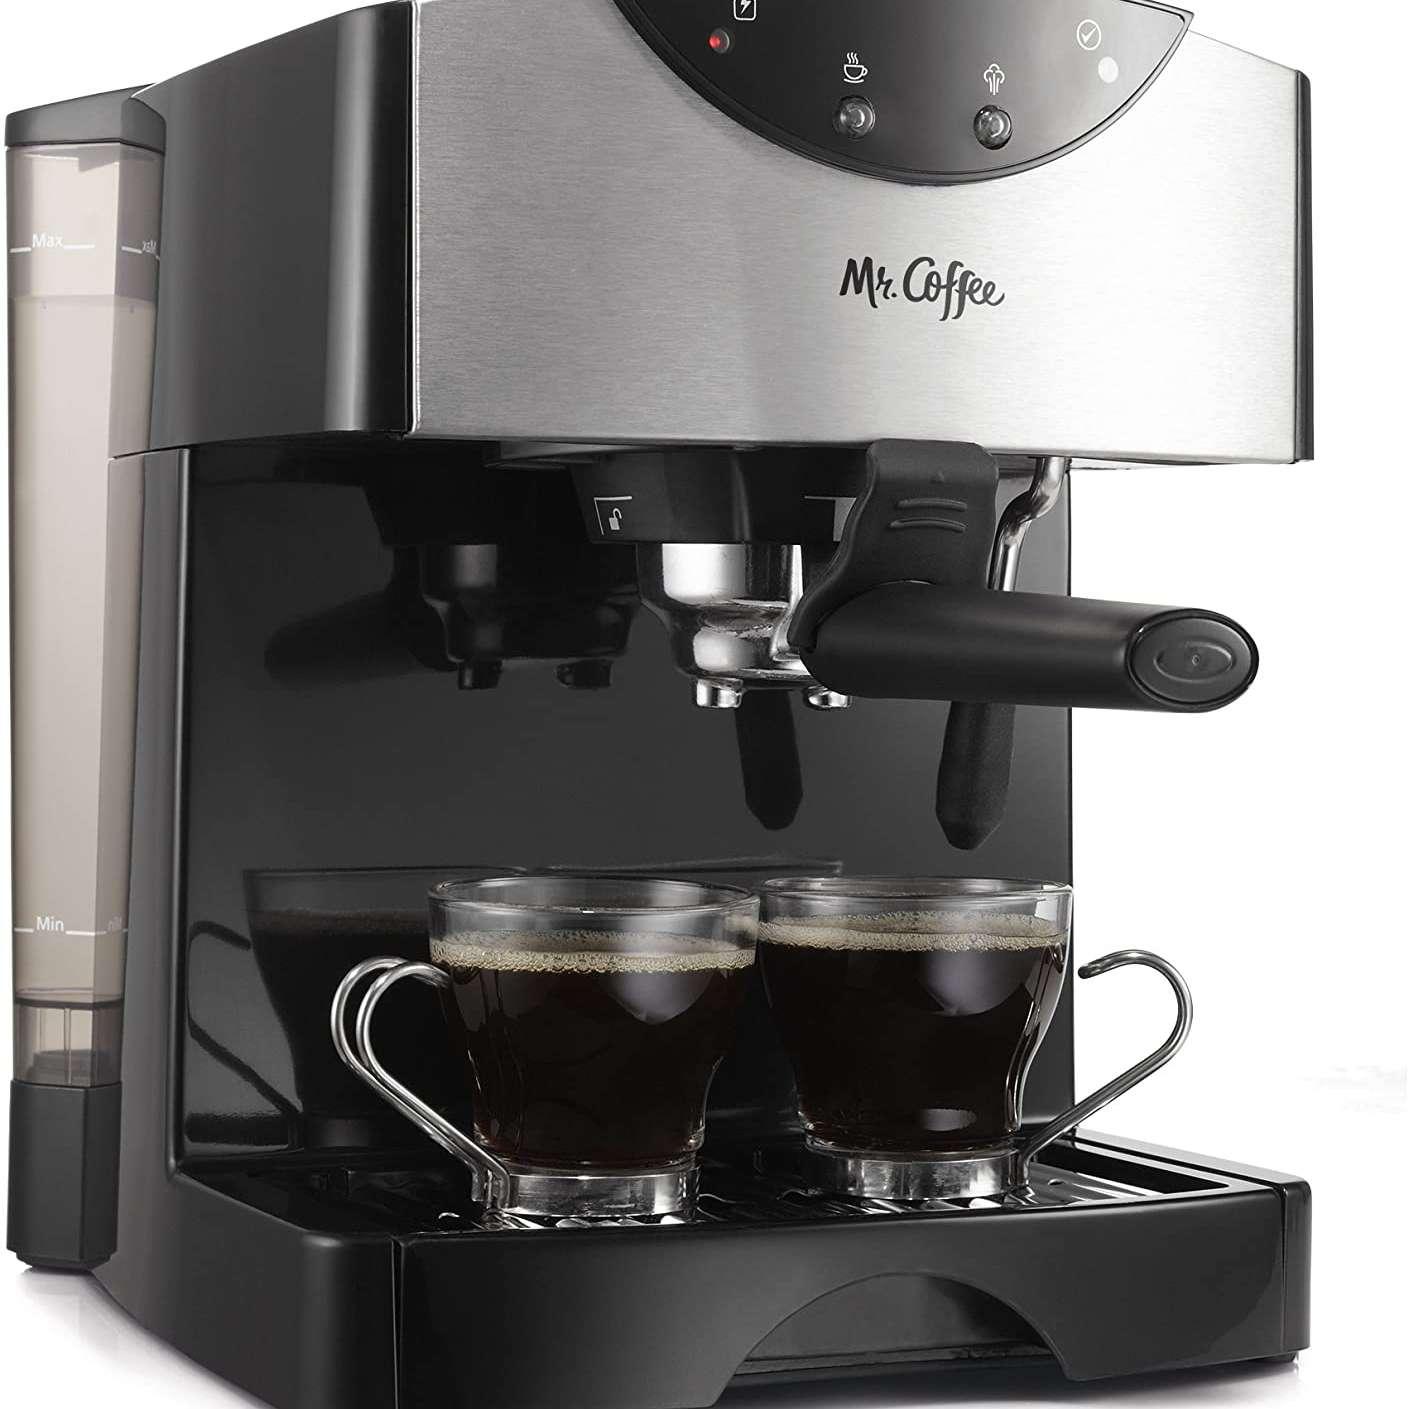 Mr. Coffee Dual Shot Espresso Maker